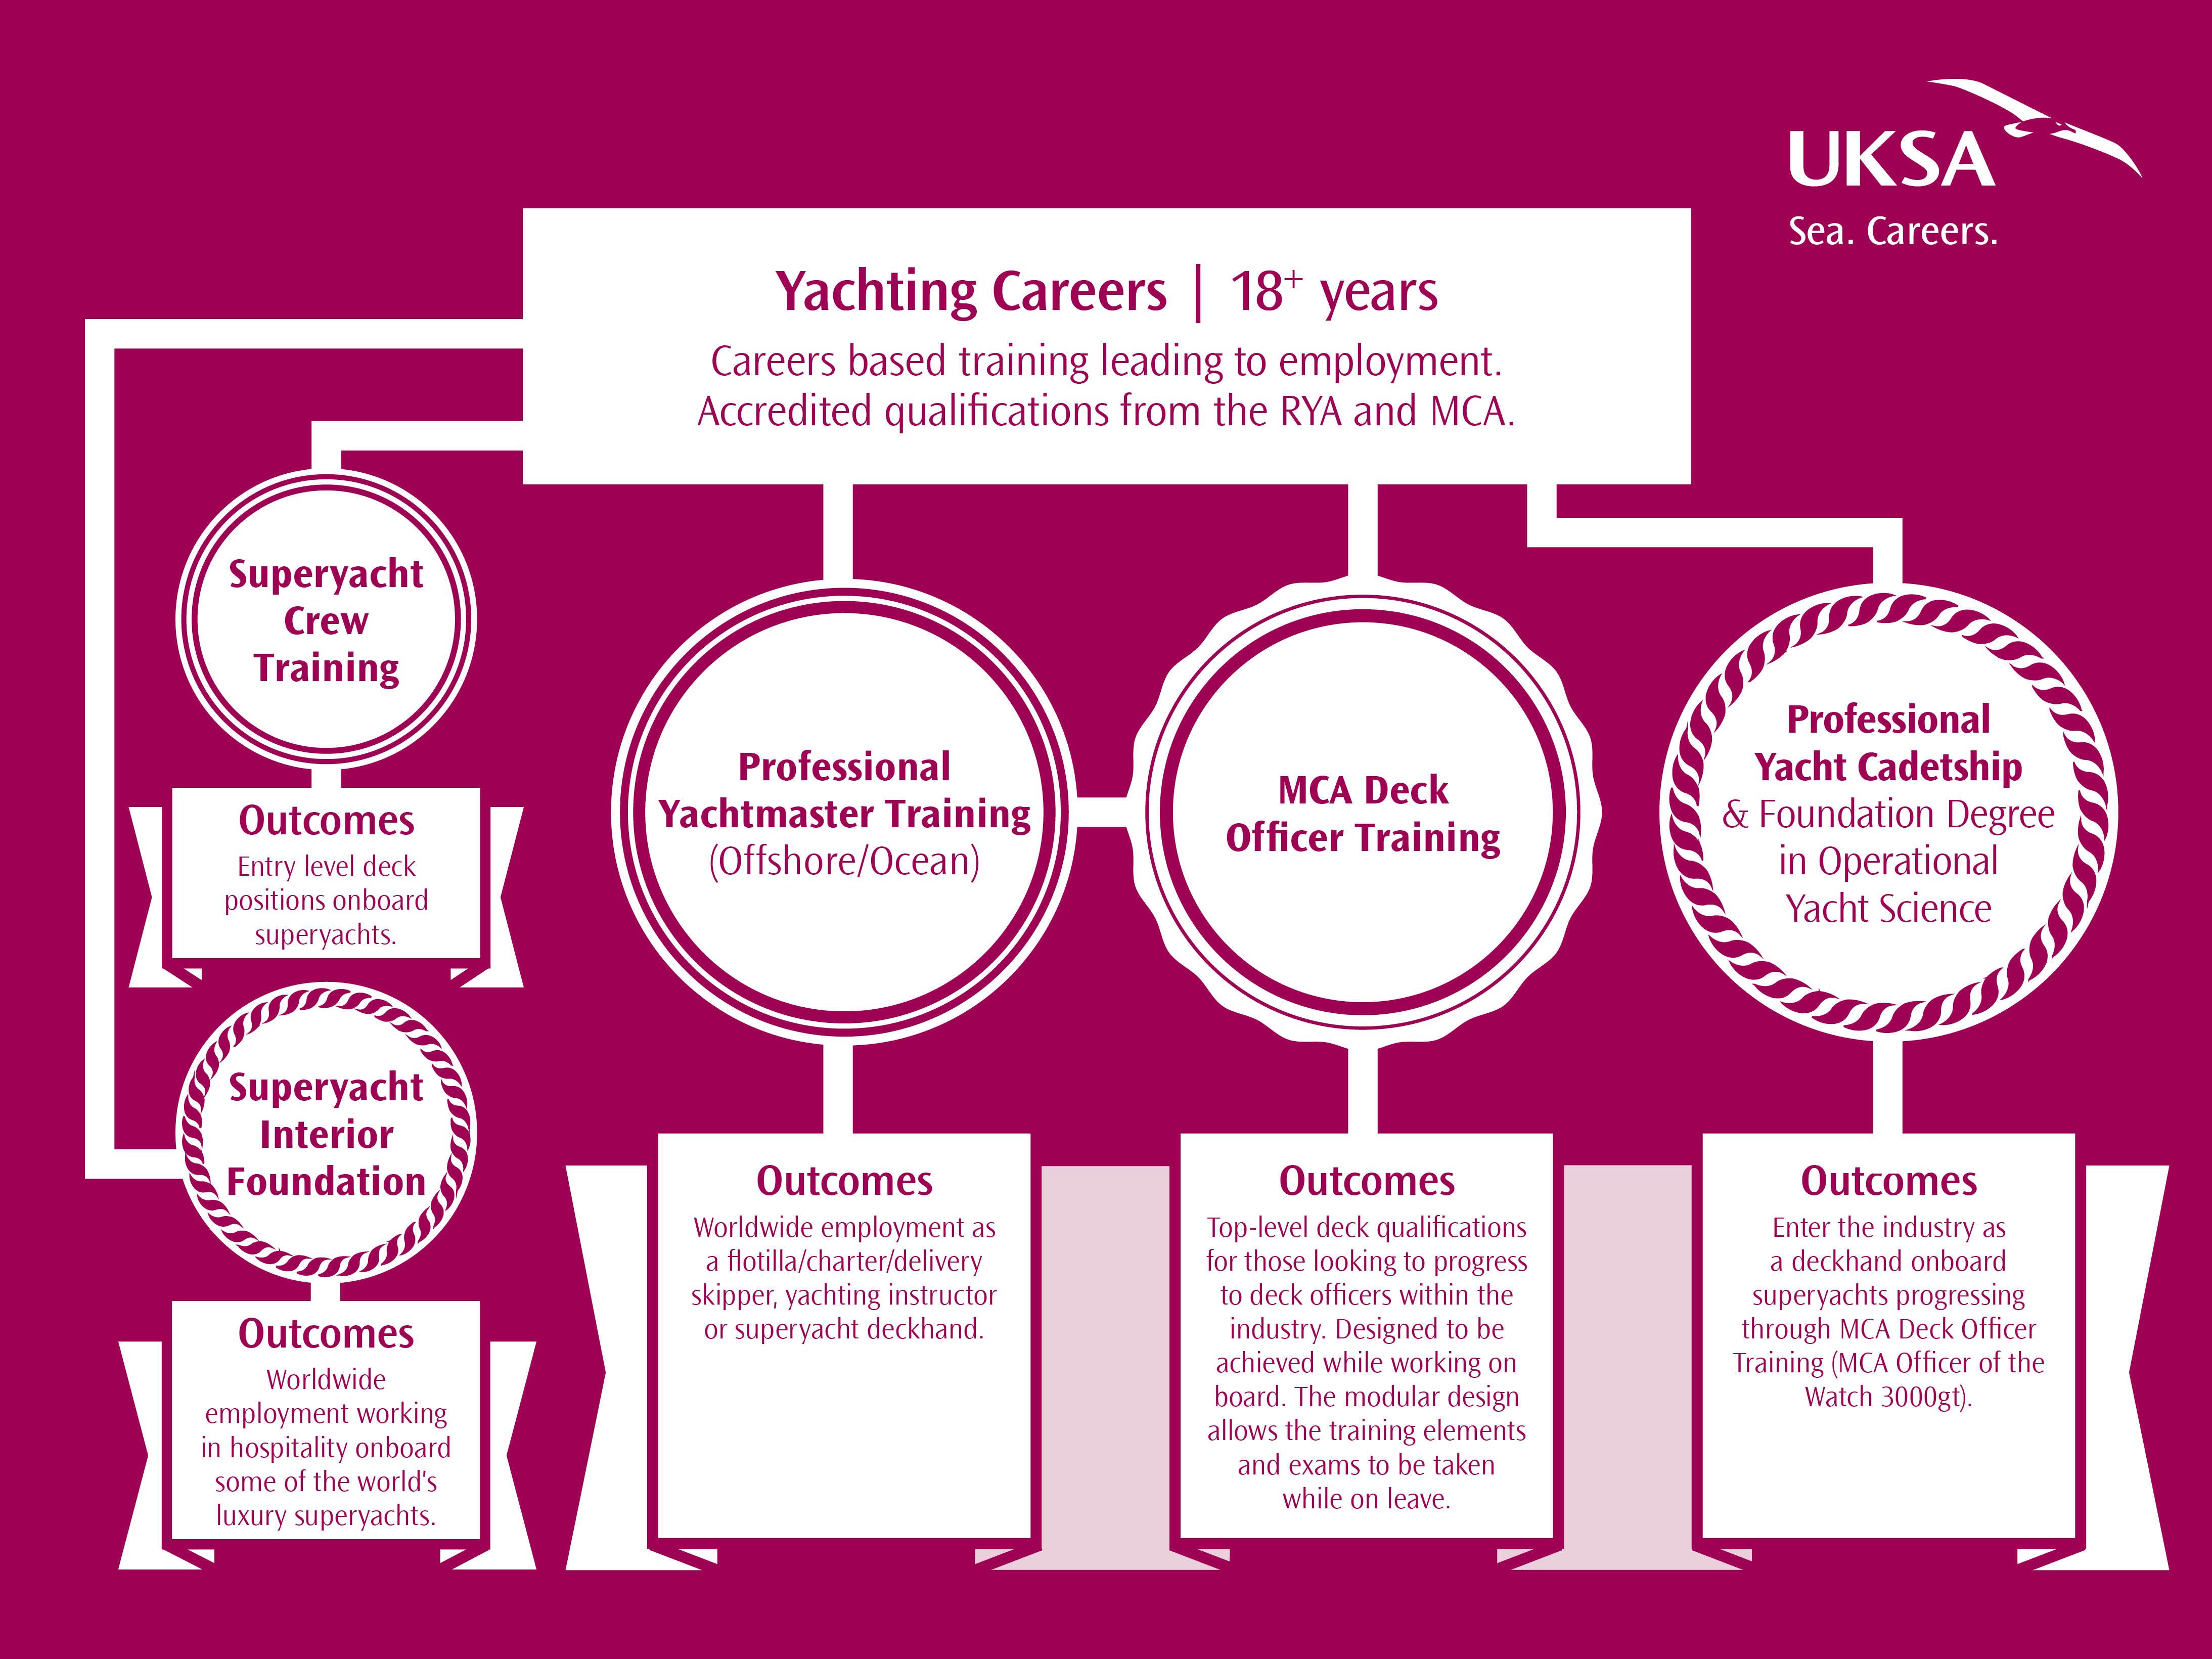 training-pathways-yachting-careers